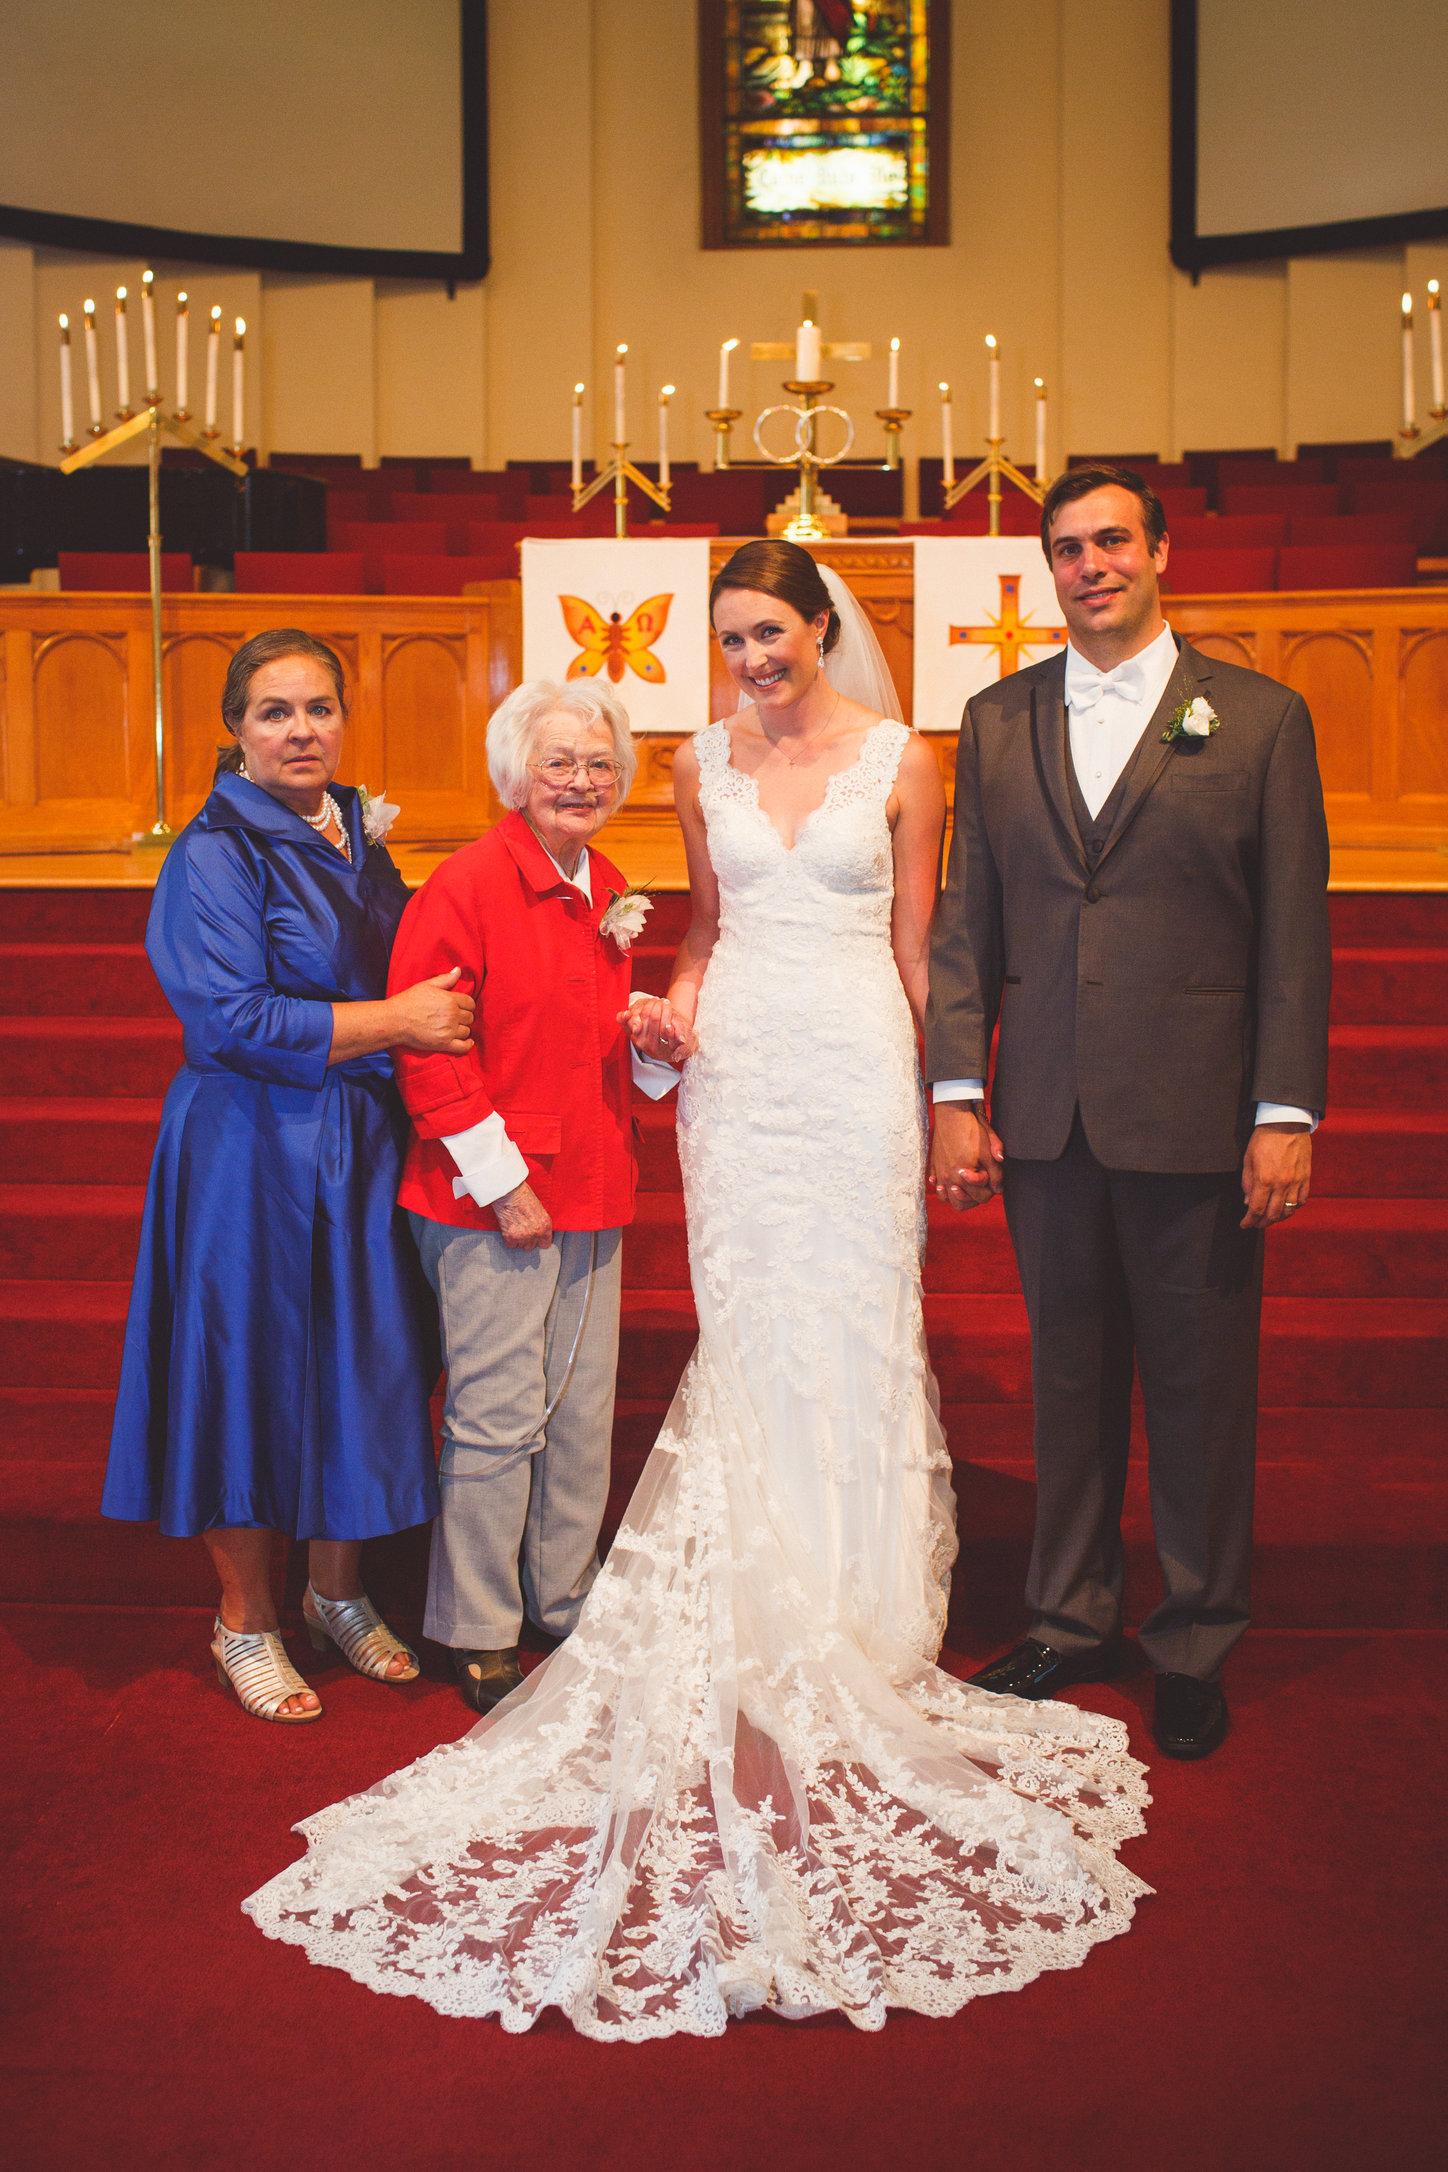 SandC-wedding-274.jpg